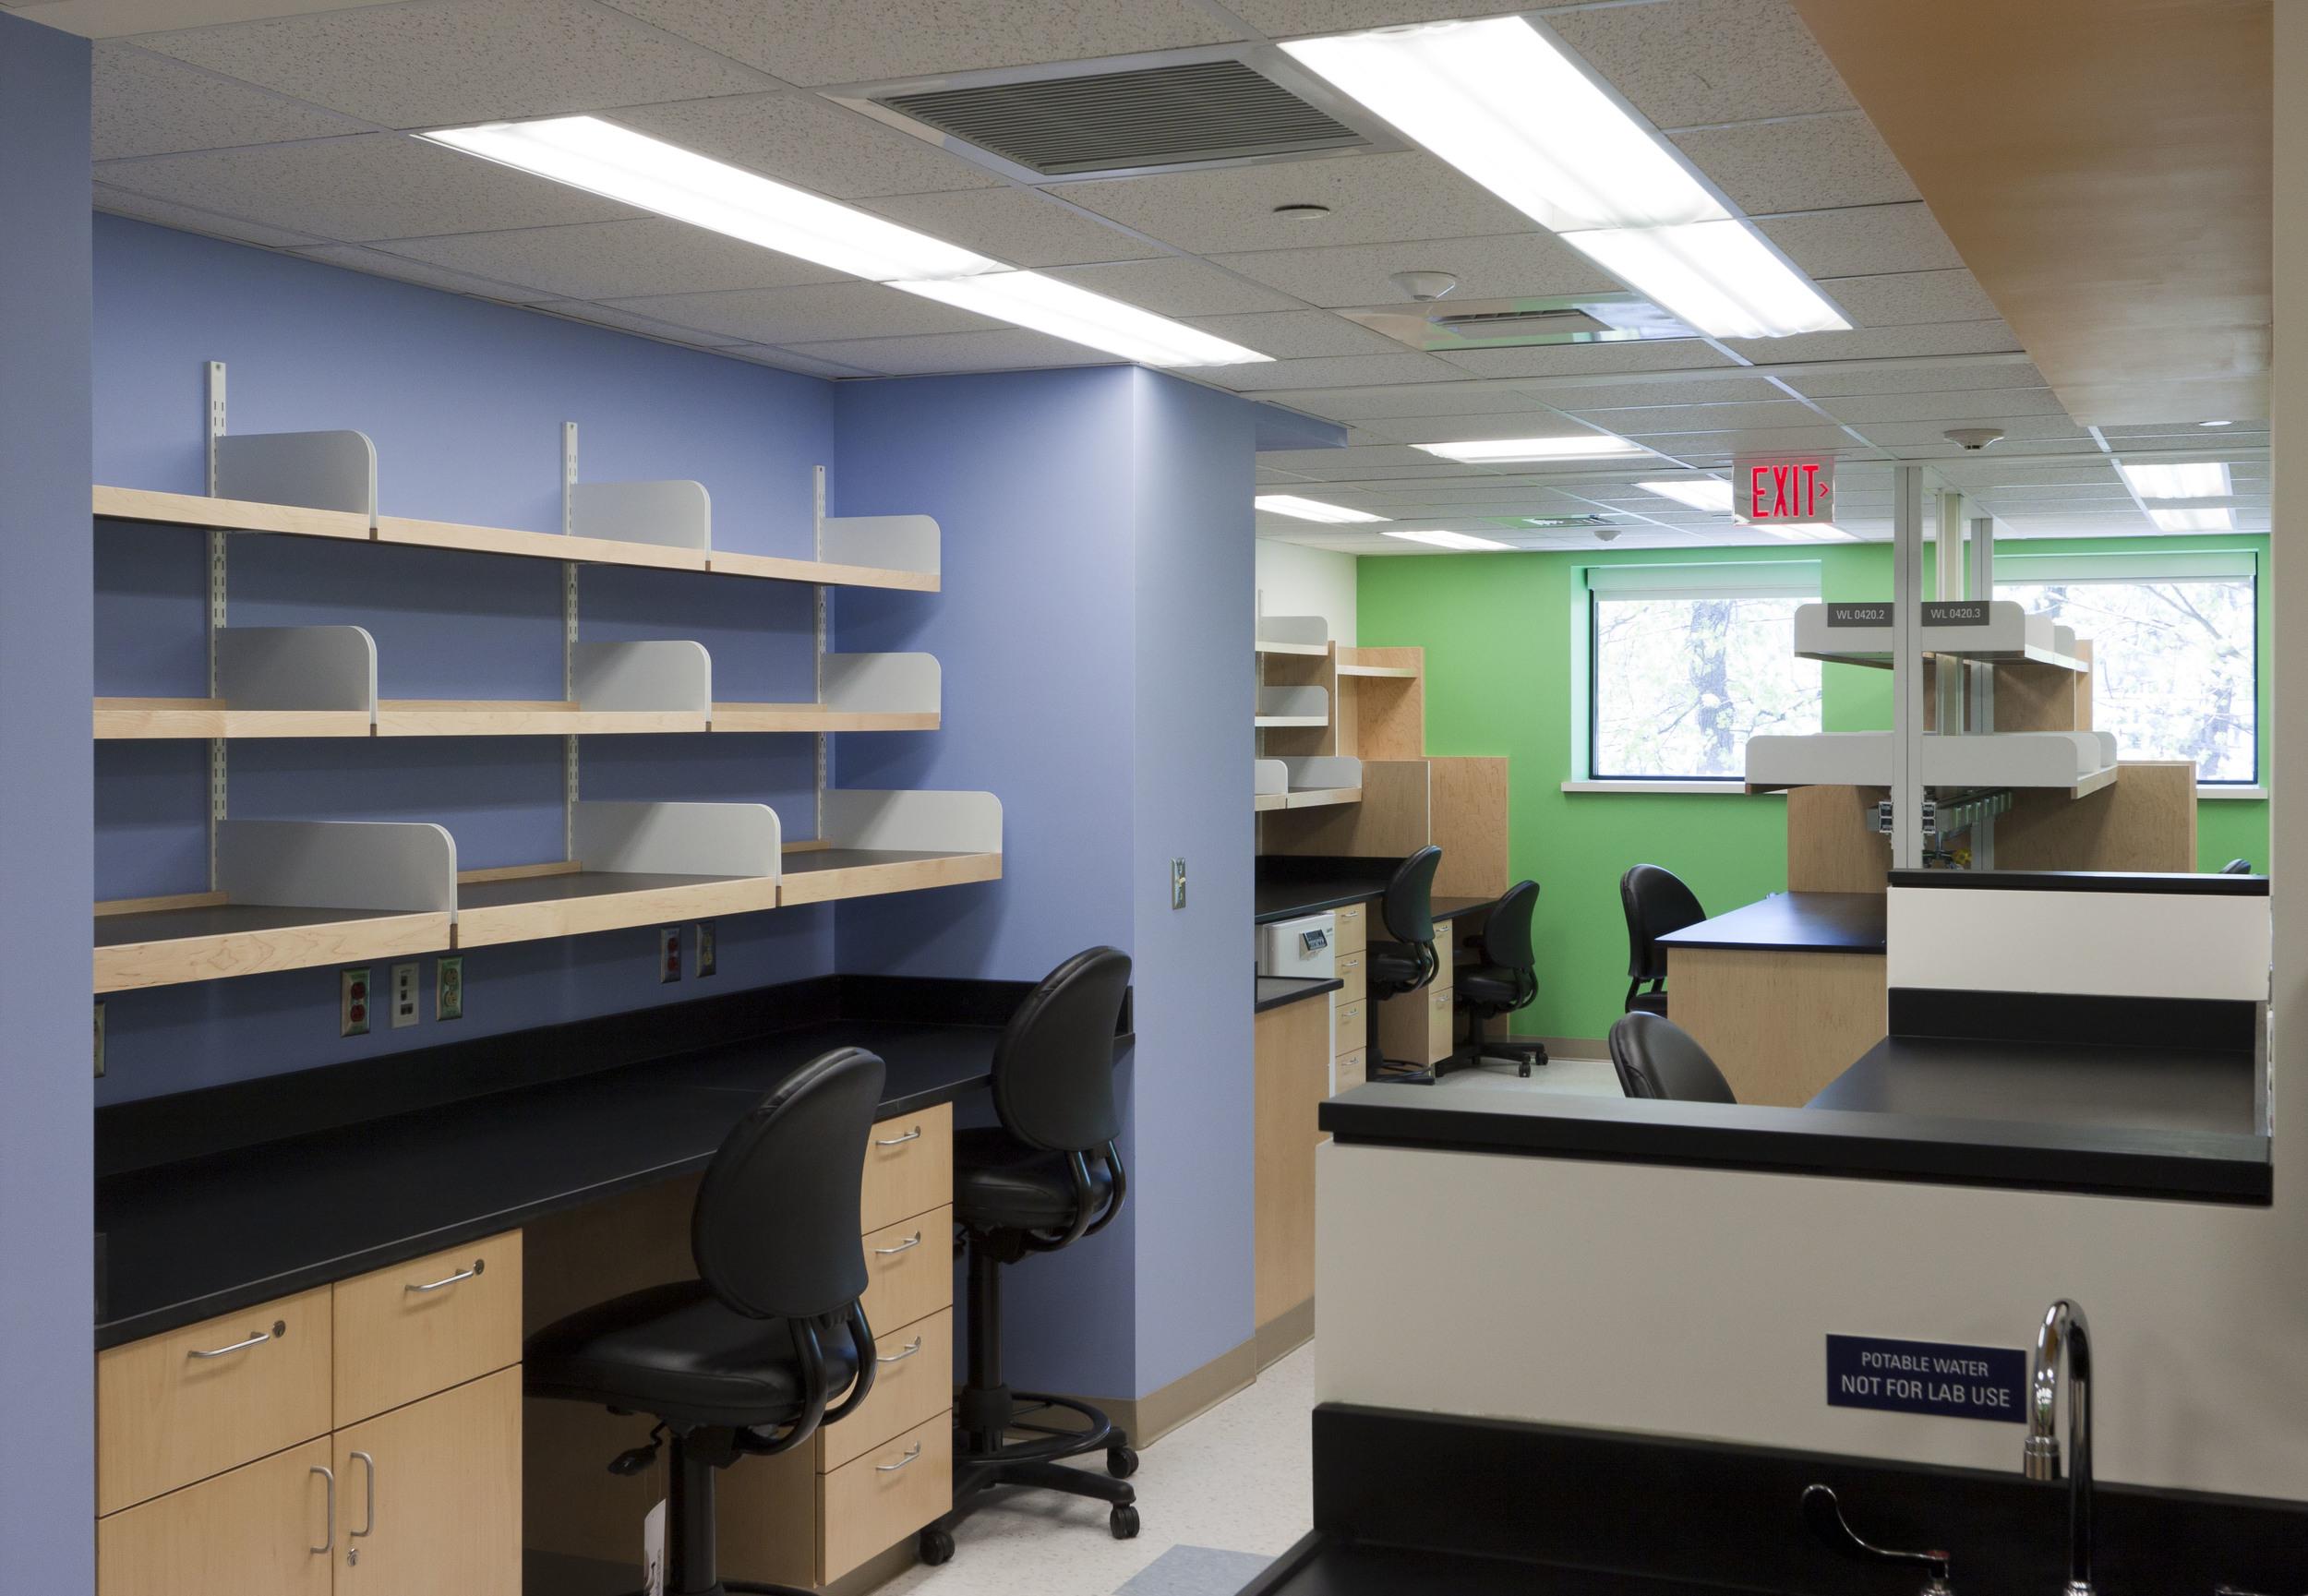 DNA Laboratory  Boston Children's Hospital, Waltham Campus